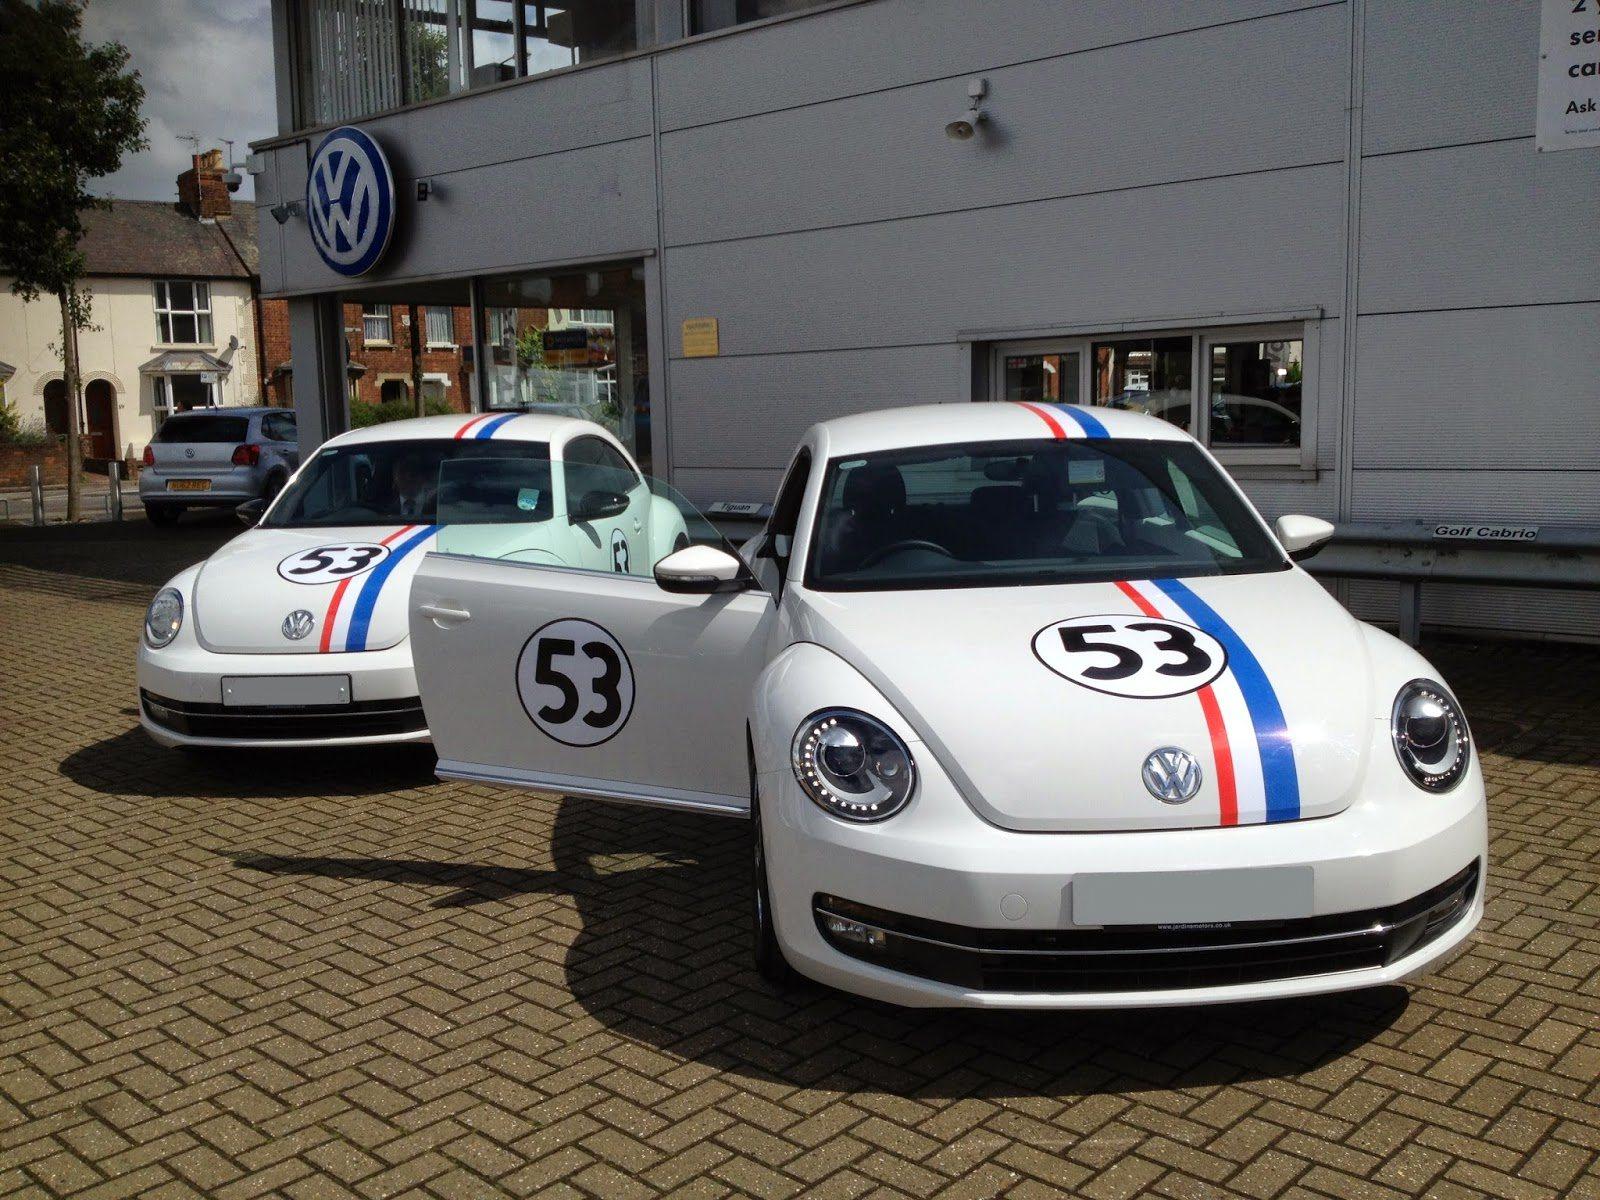 Vender mi Volkswagen de segunda mano